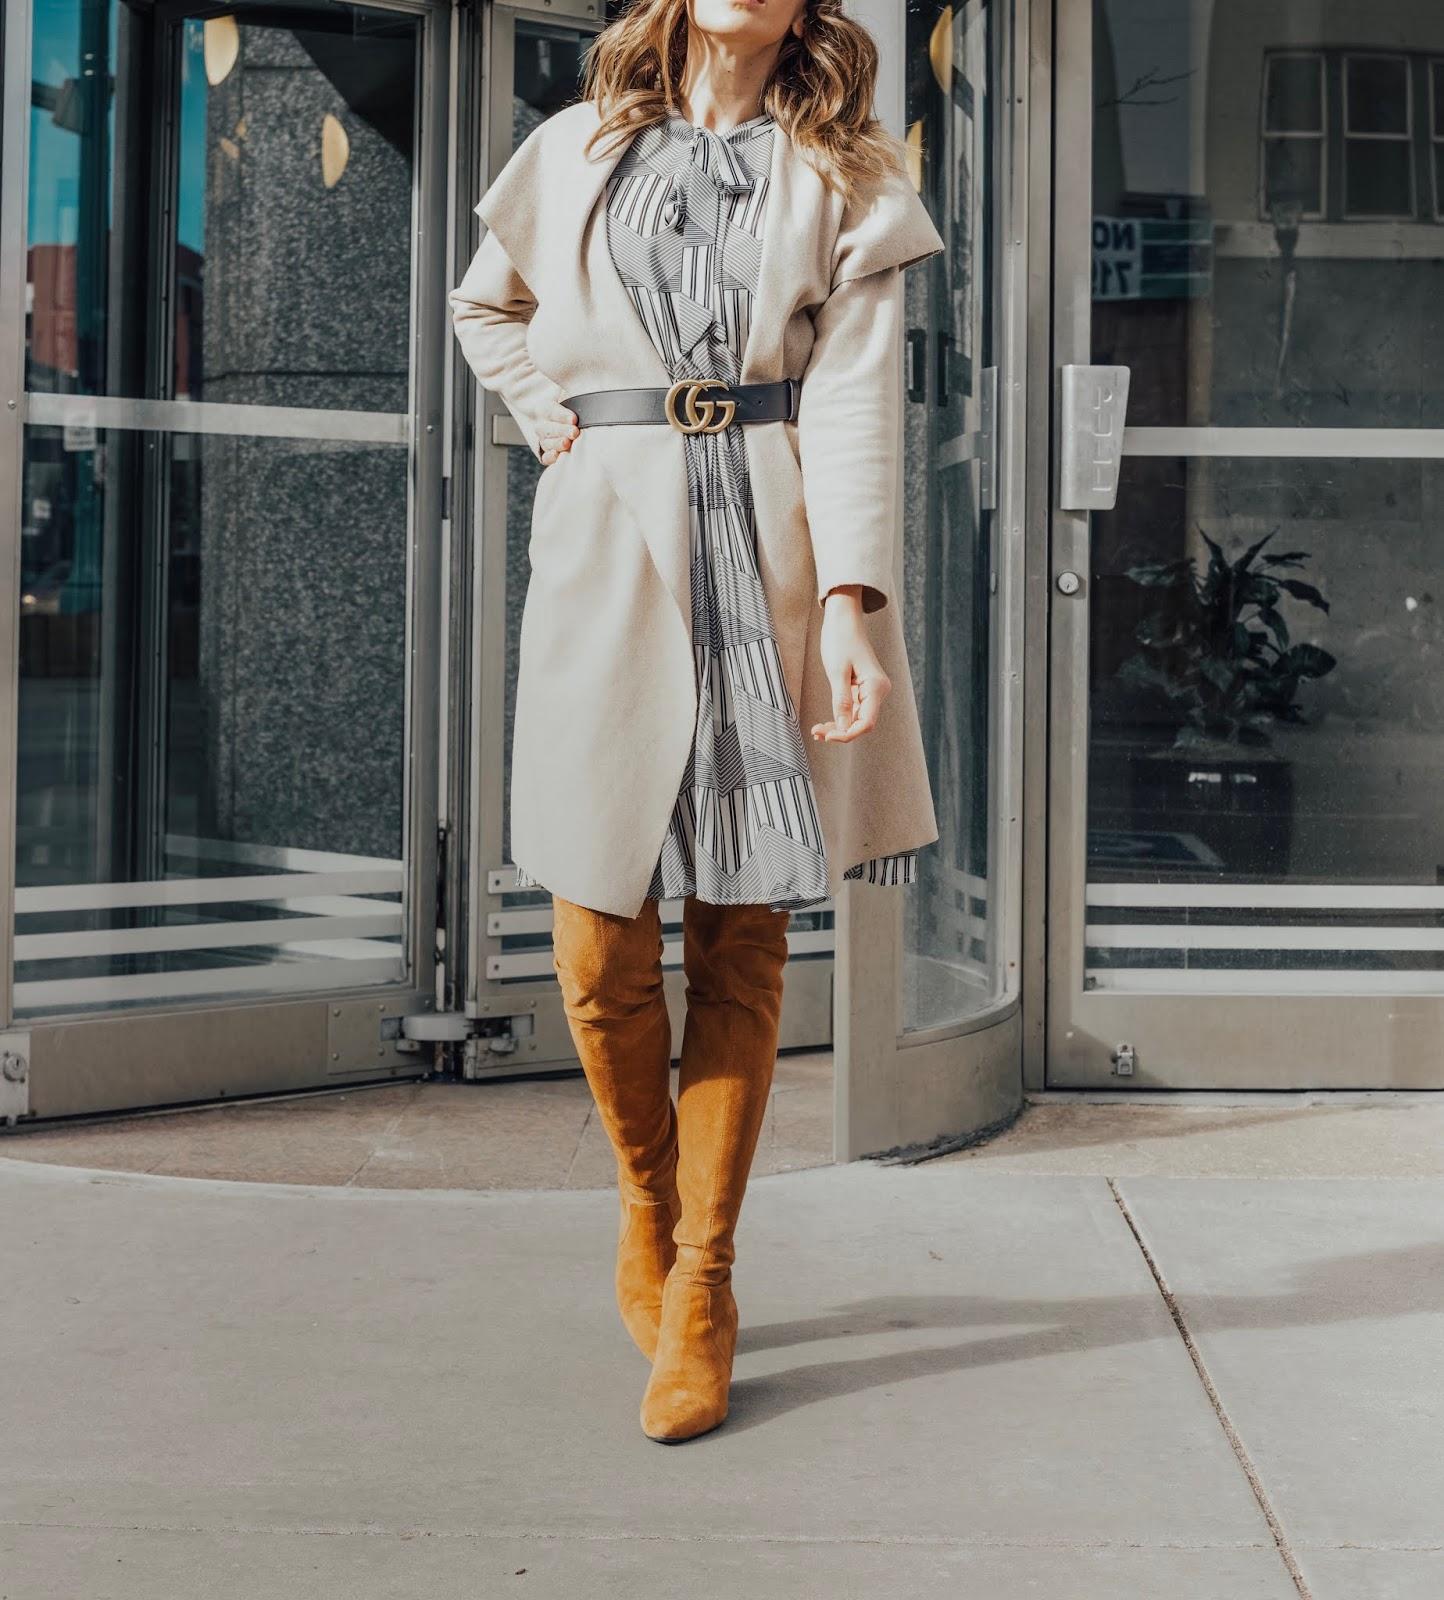 Dress Jacket and OTK Boots